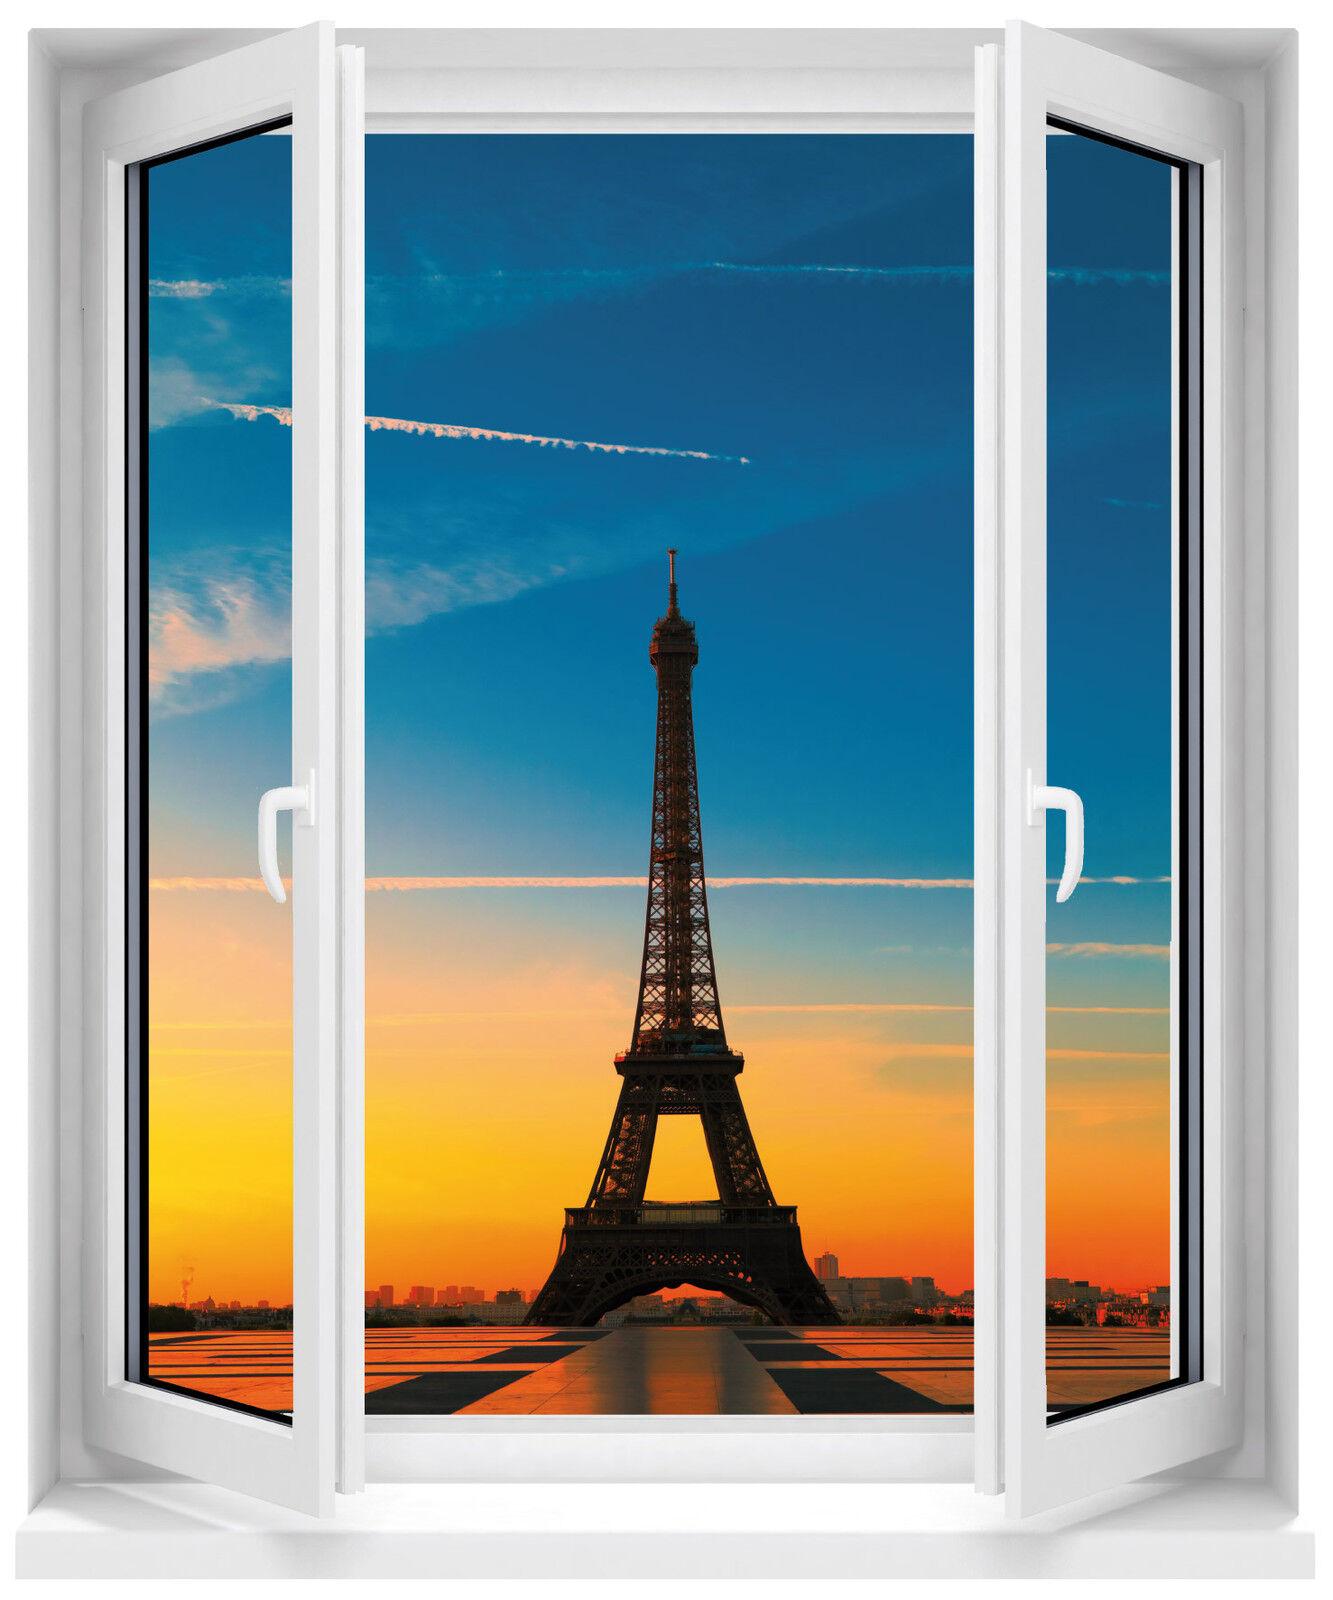 Adhesivo Ventana Torre Eiffel 80x100cm Ref F513